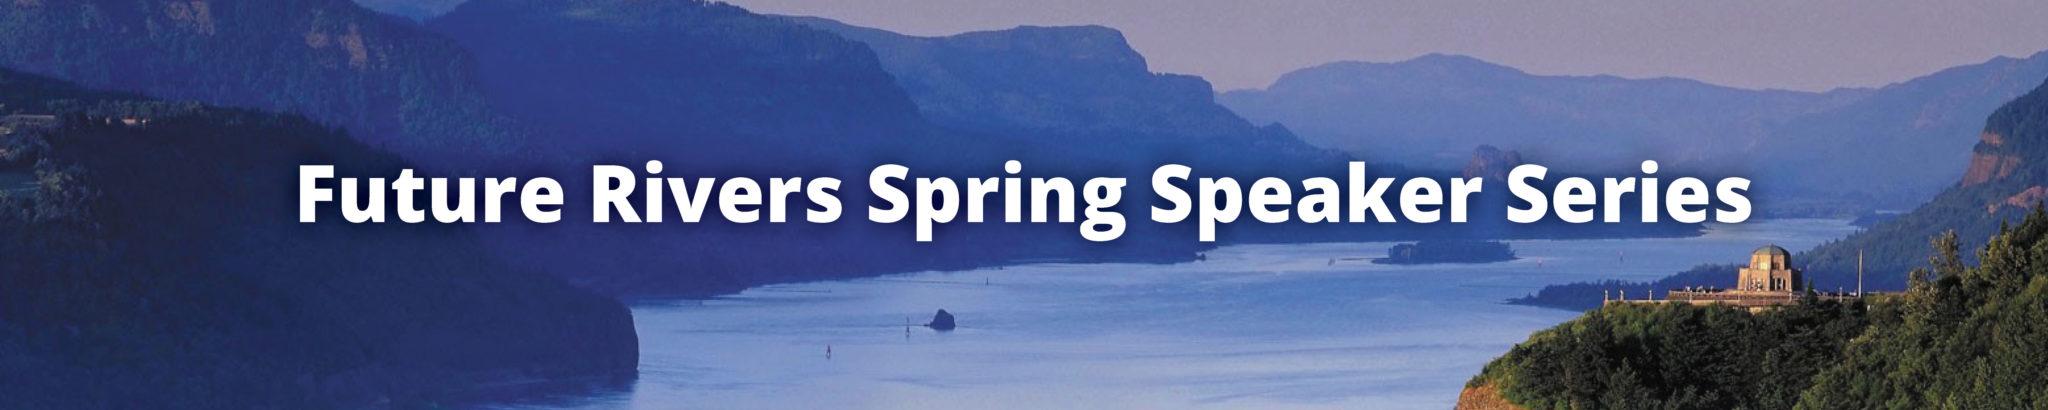 Future Rivers Spring Speaker Series Episode 3: Crisis (Public Health & Global Politics)